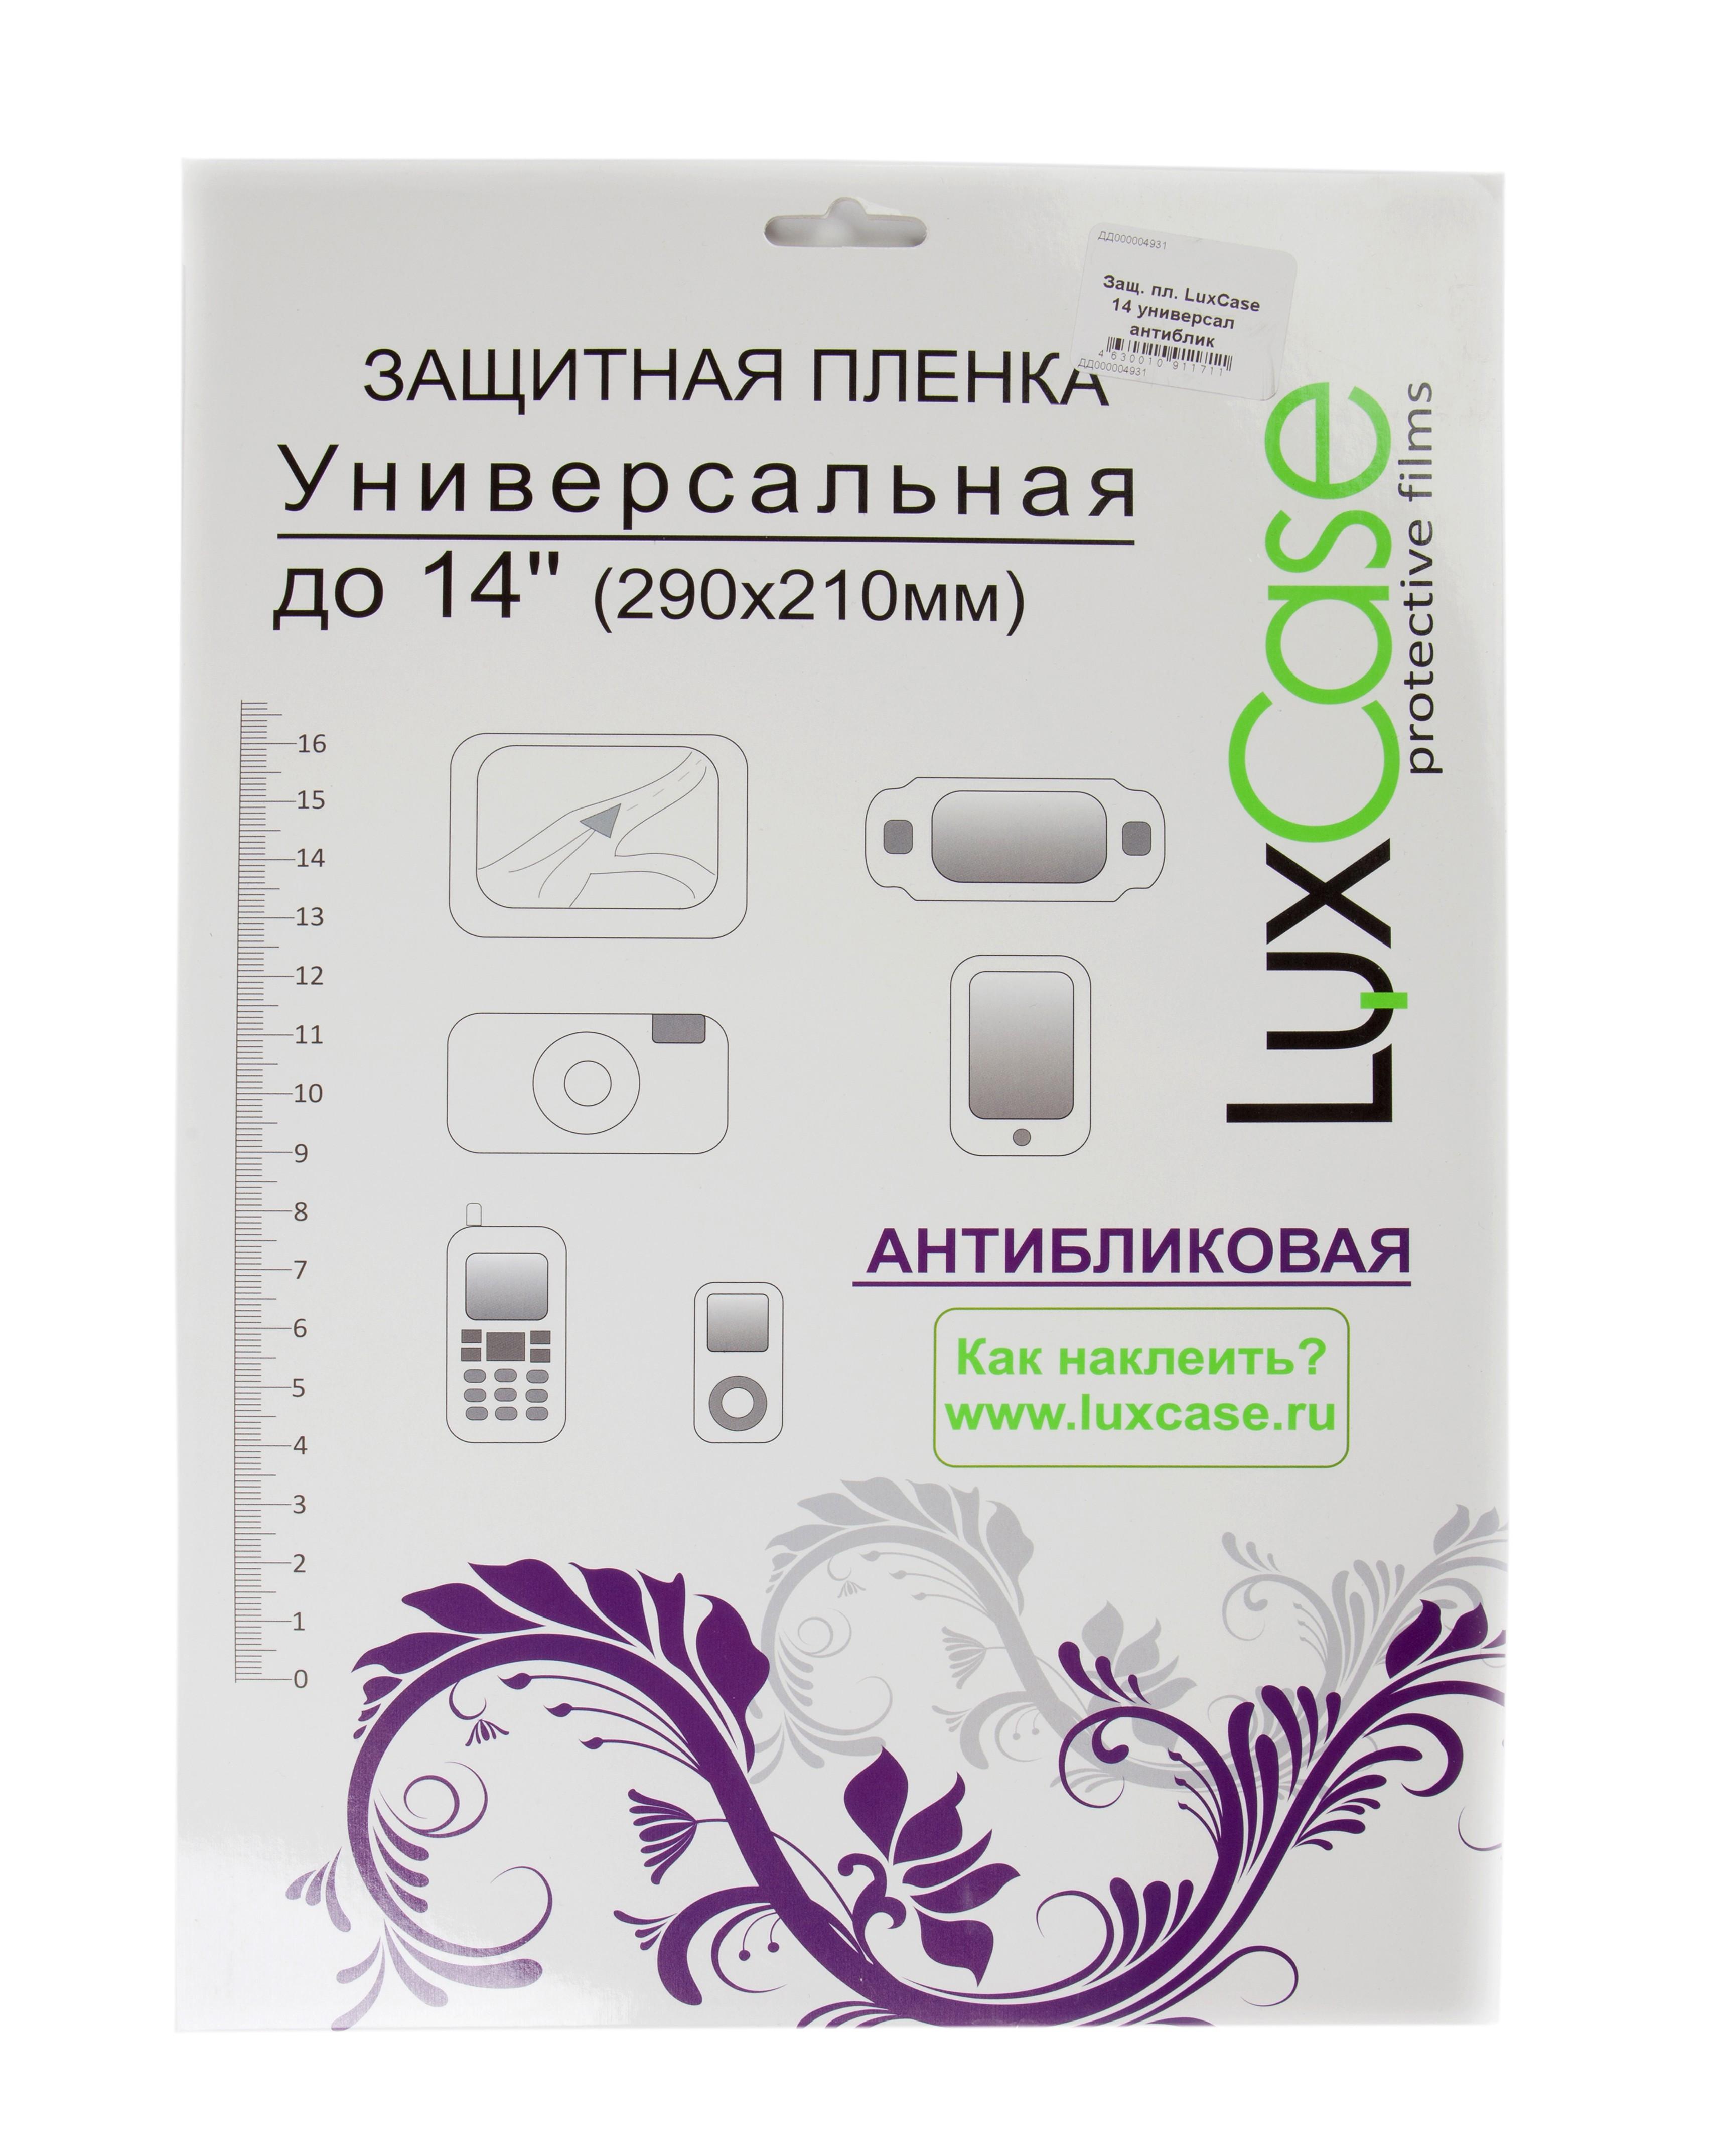 f03 zawita displey luxcase 14 universal antiblik 1